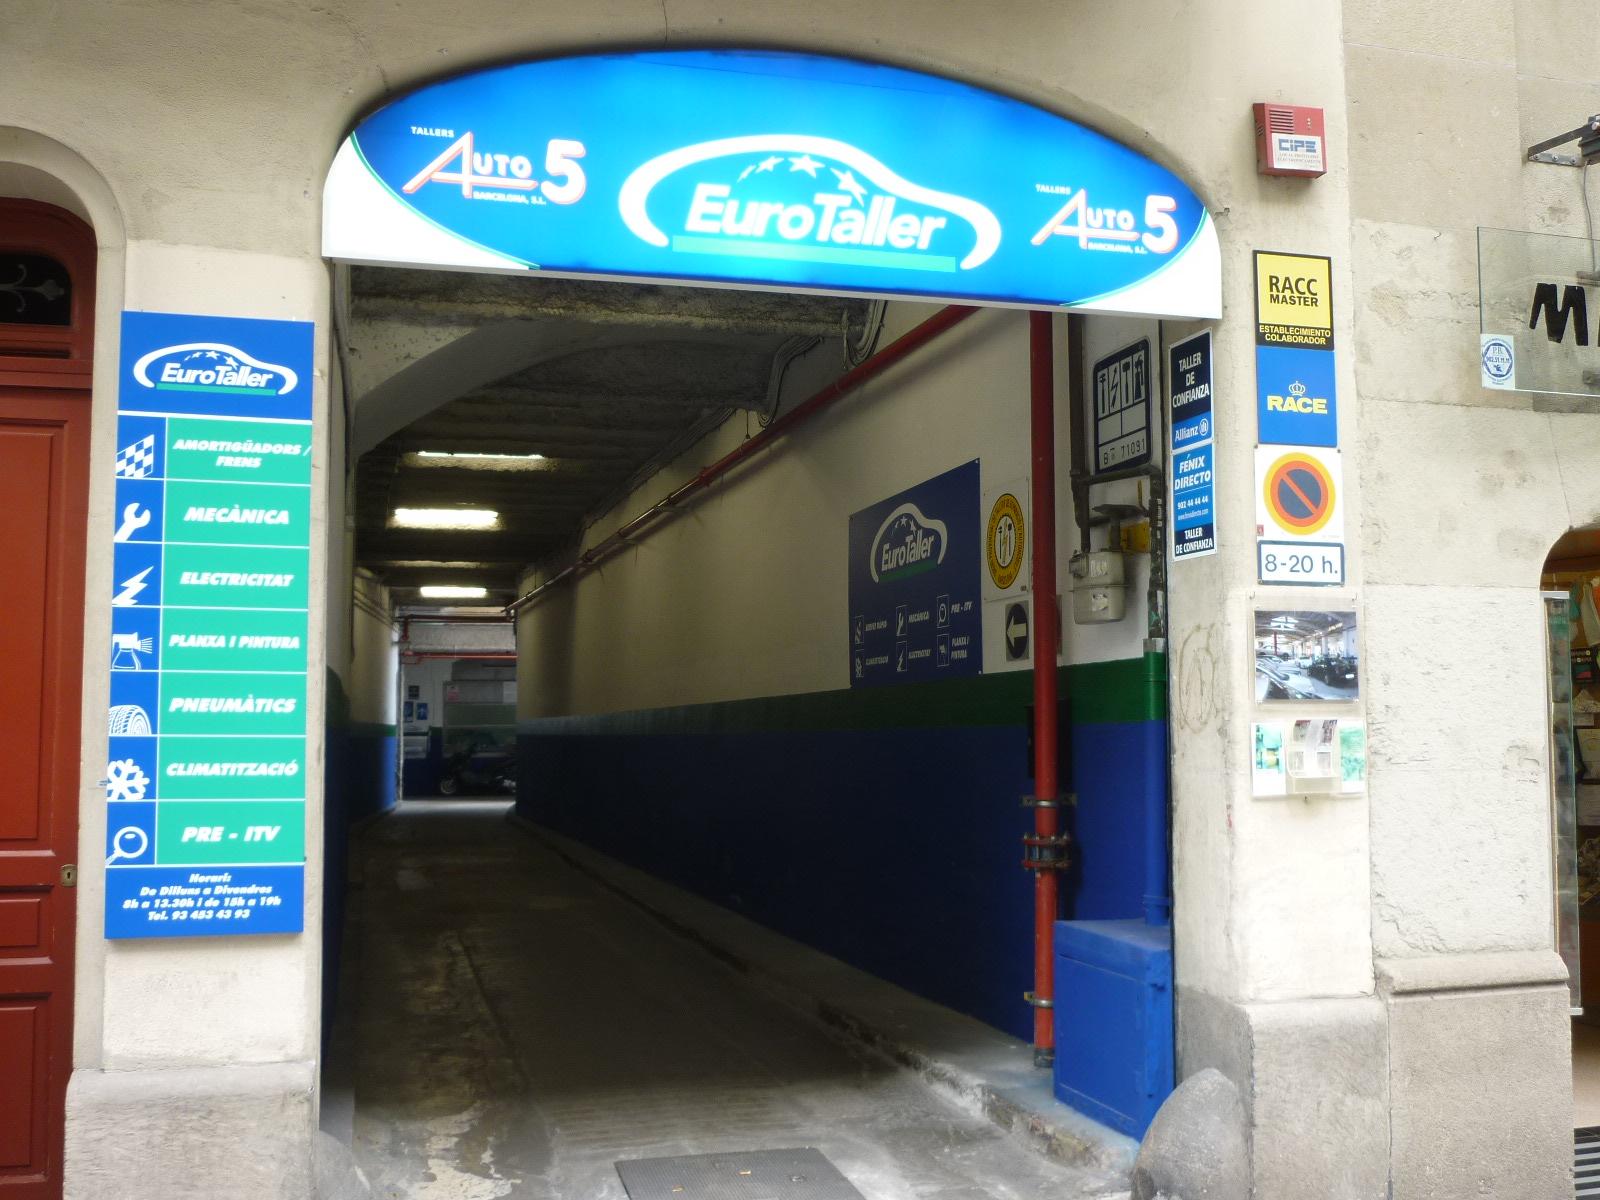 Talleres Auto 5 Barcelona